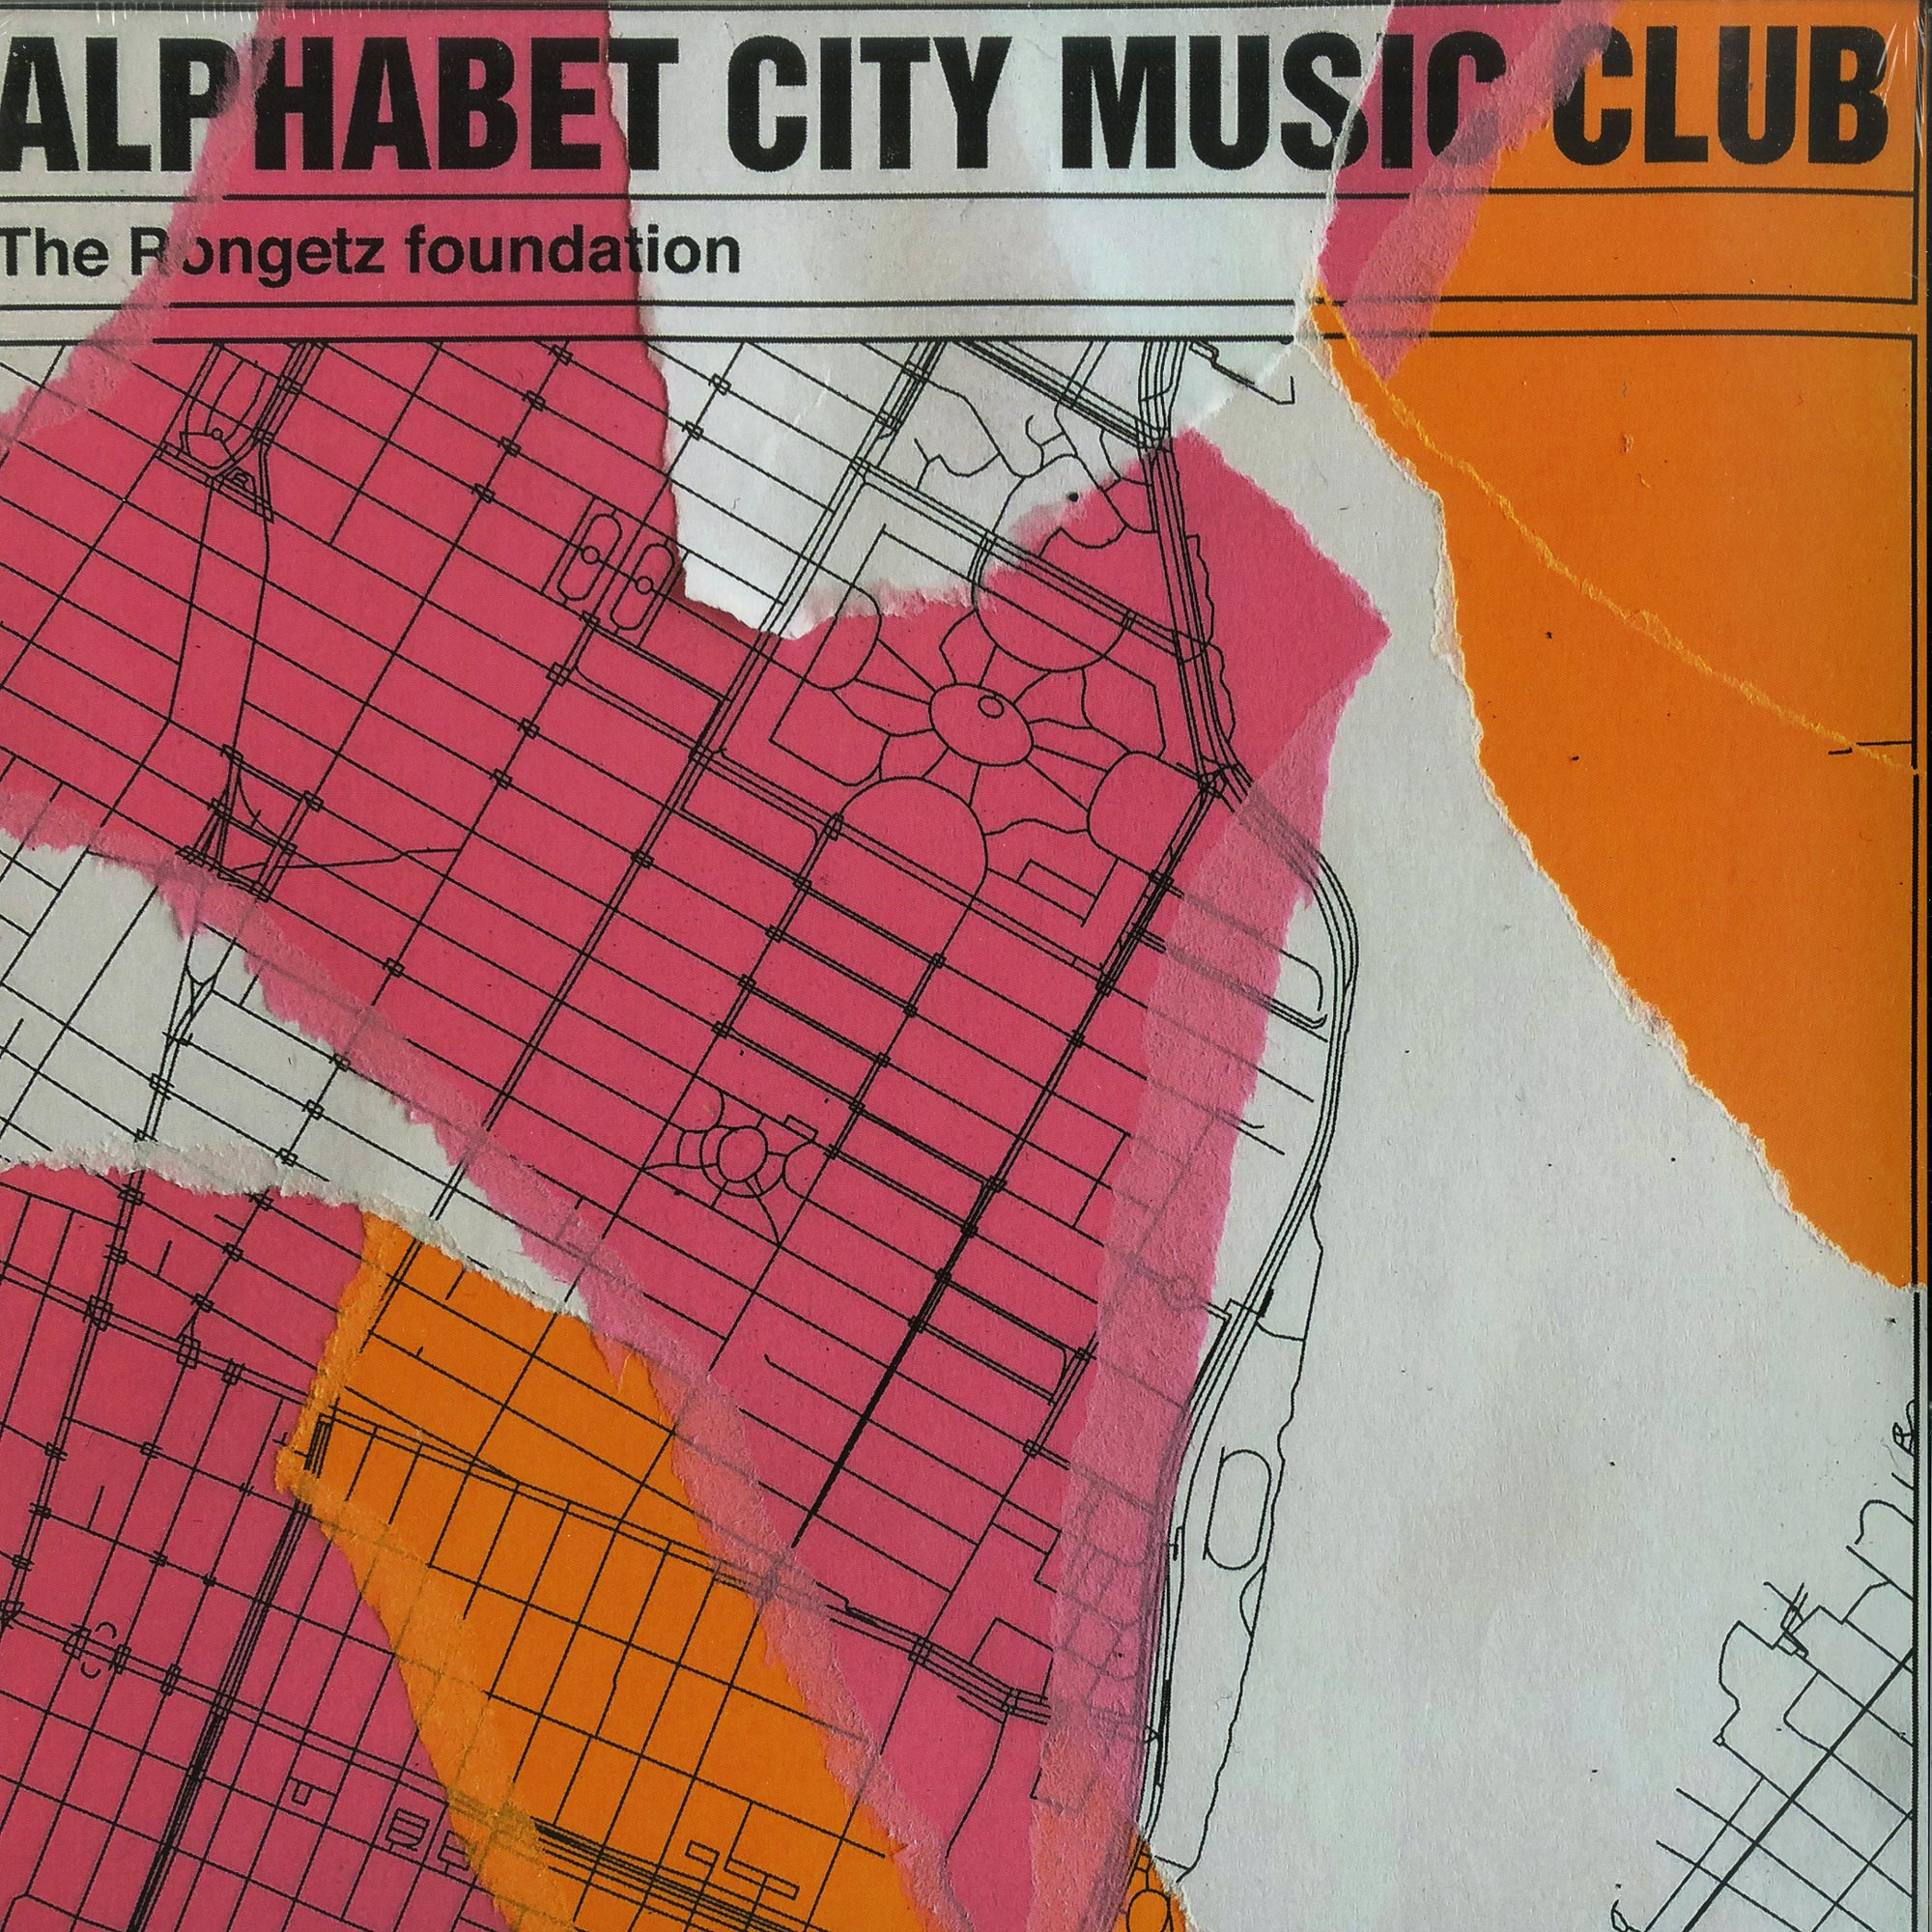 The Rongets Foundation - ALPHABET CITY MUSIC CLUB